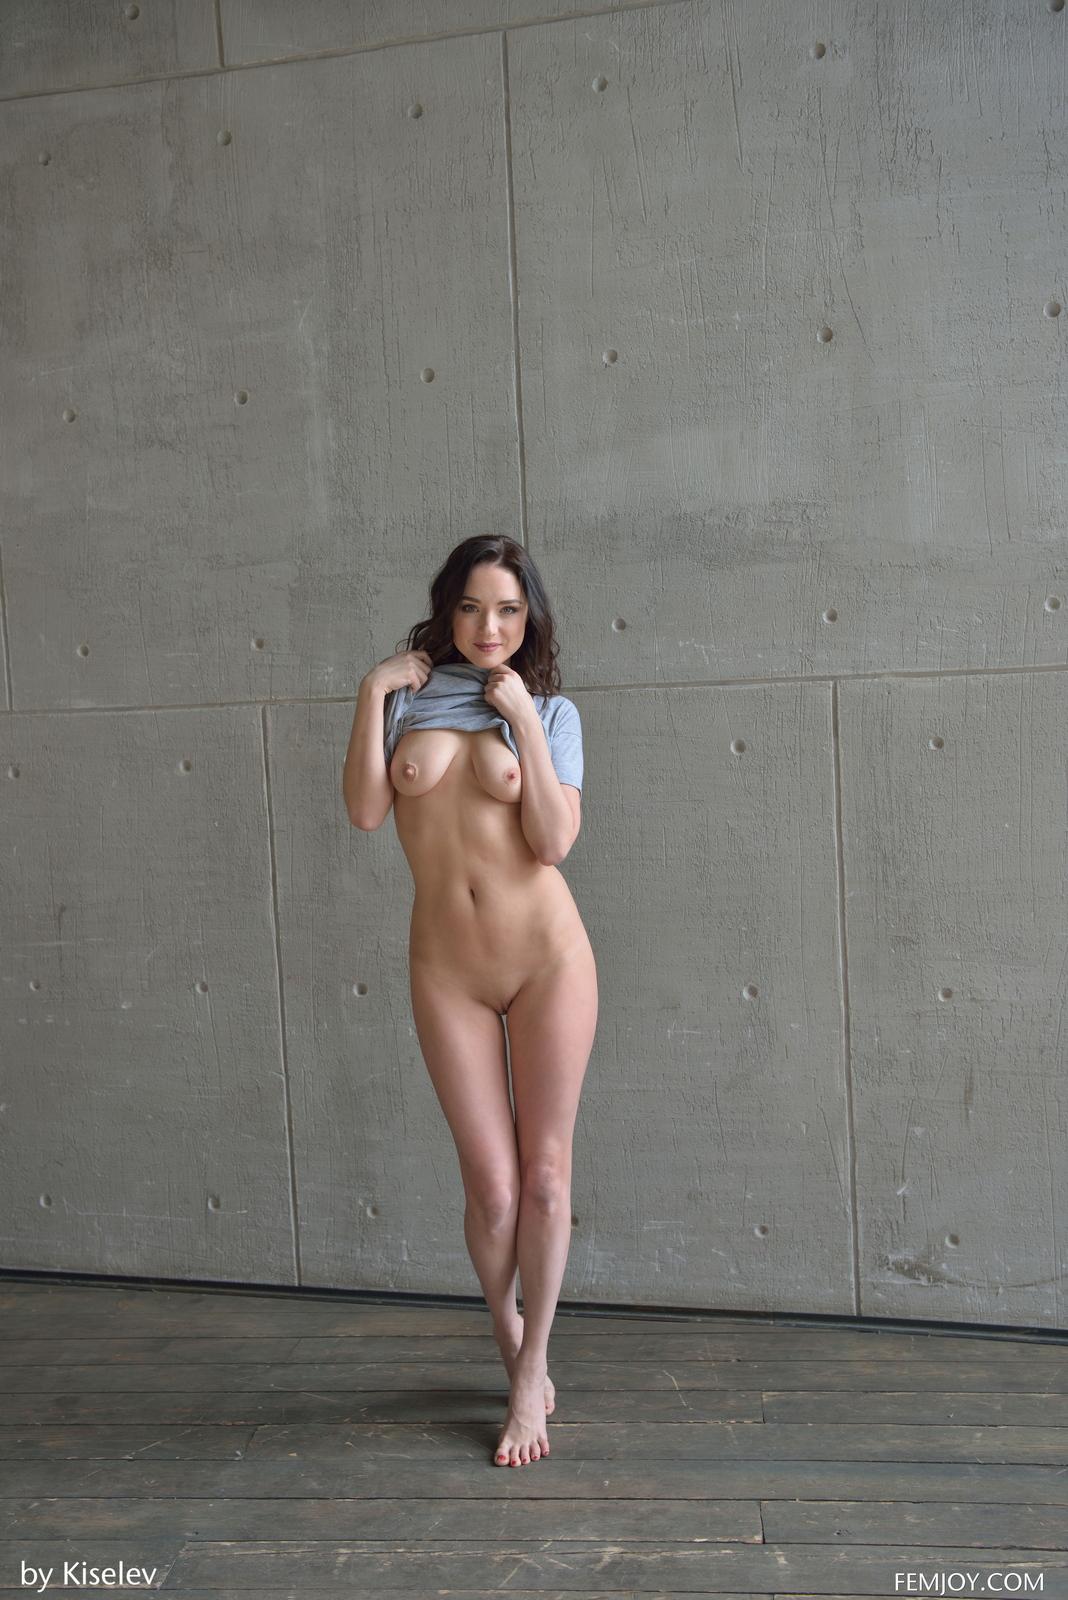 nika-a-naked-bottomless-grey-shirt-pussy-femjoy-09